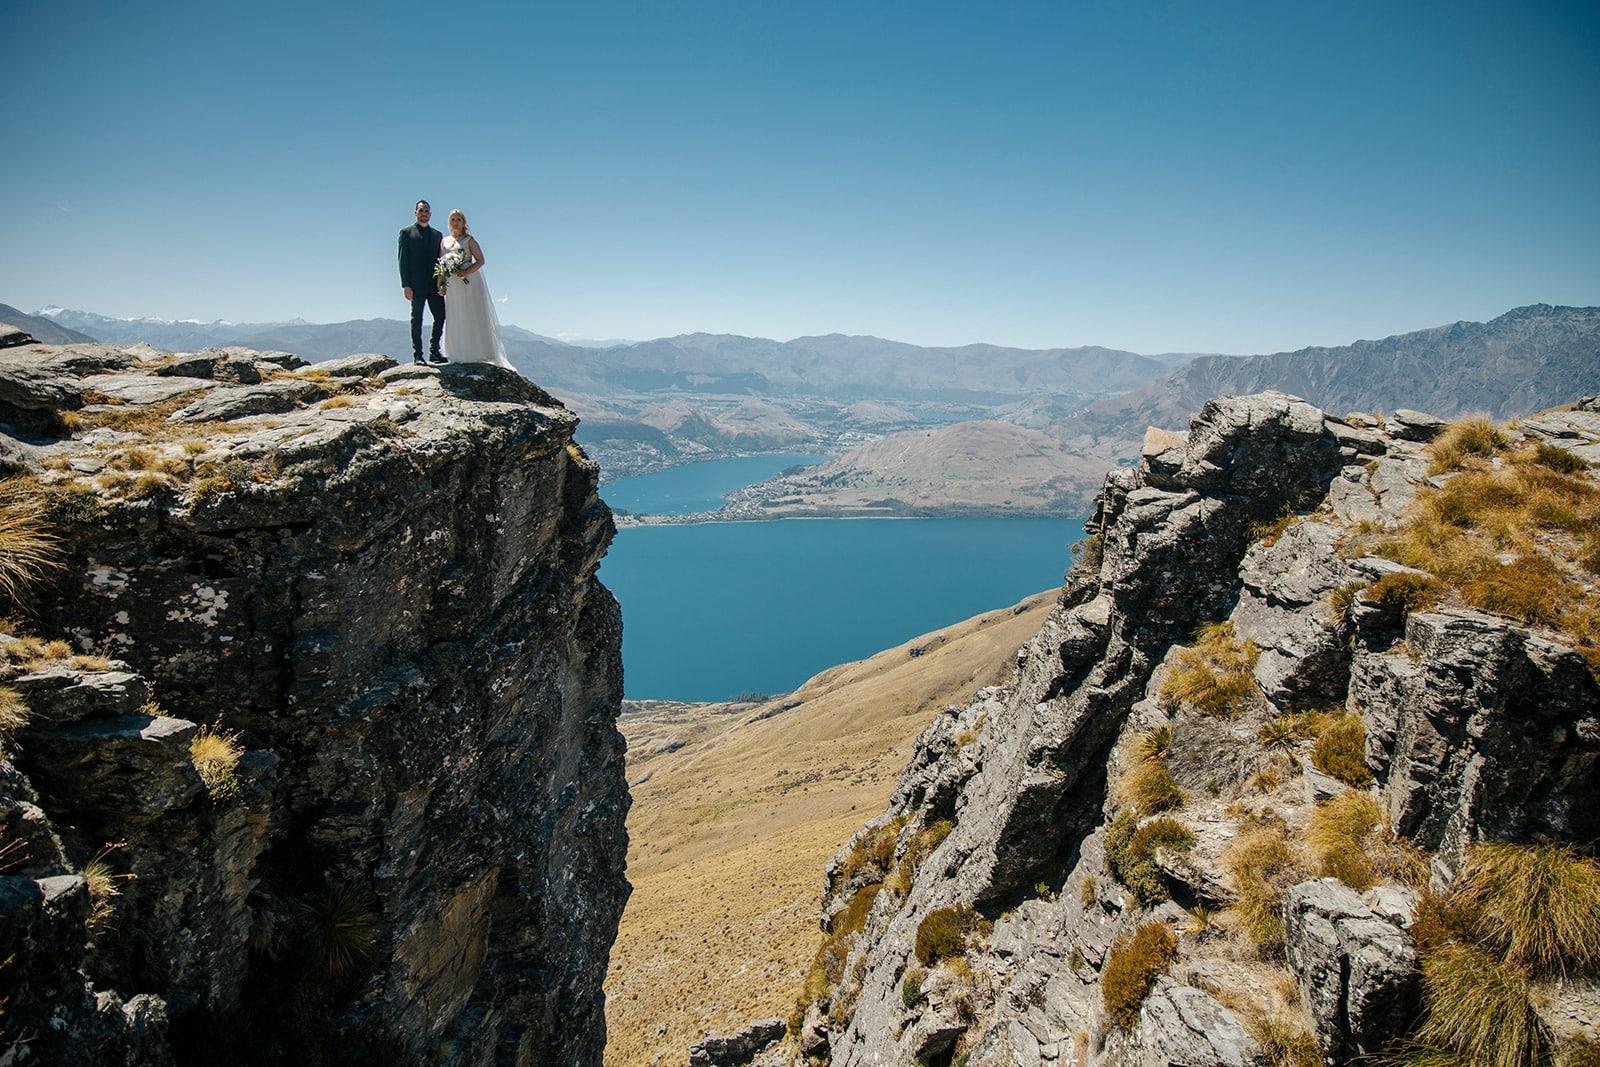 Queenstown elopement wedding photos on The Ledge